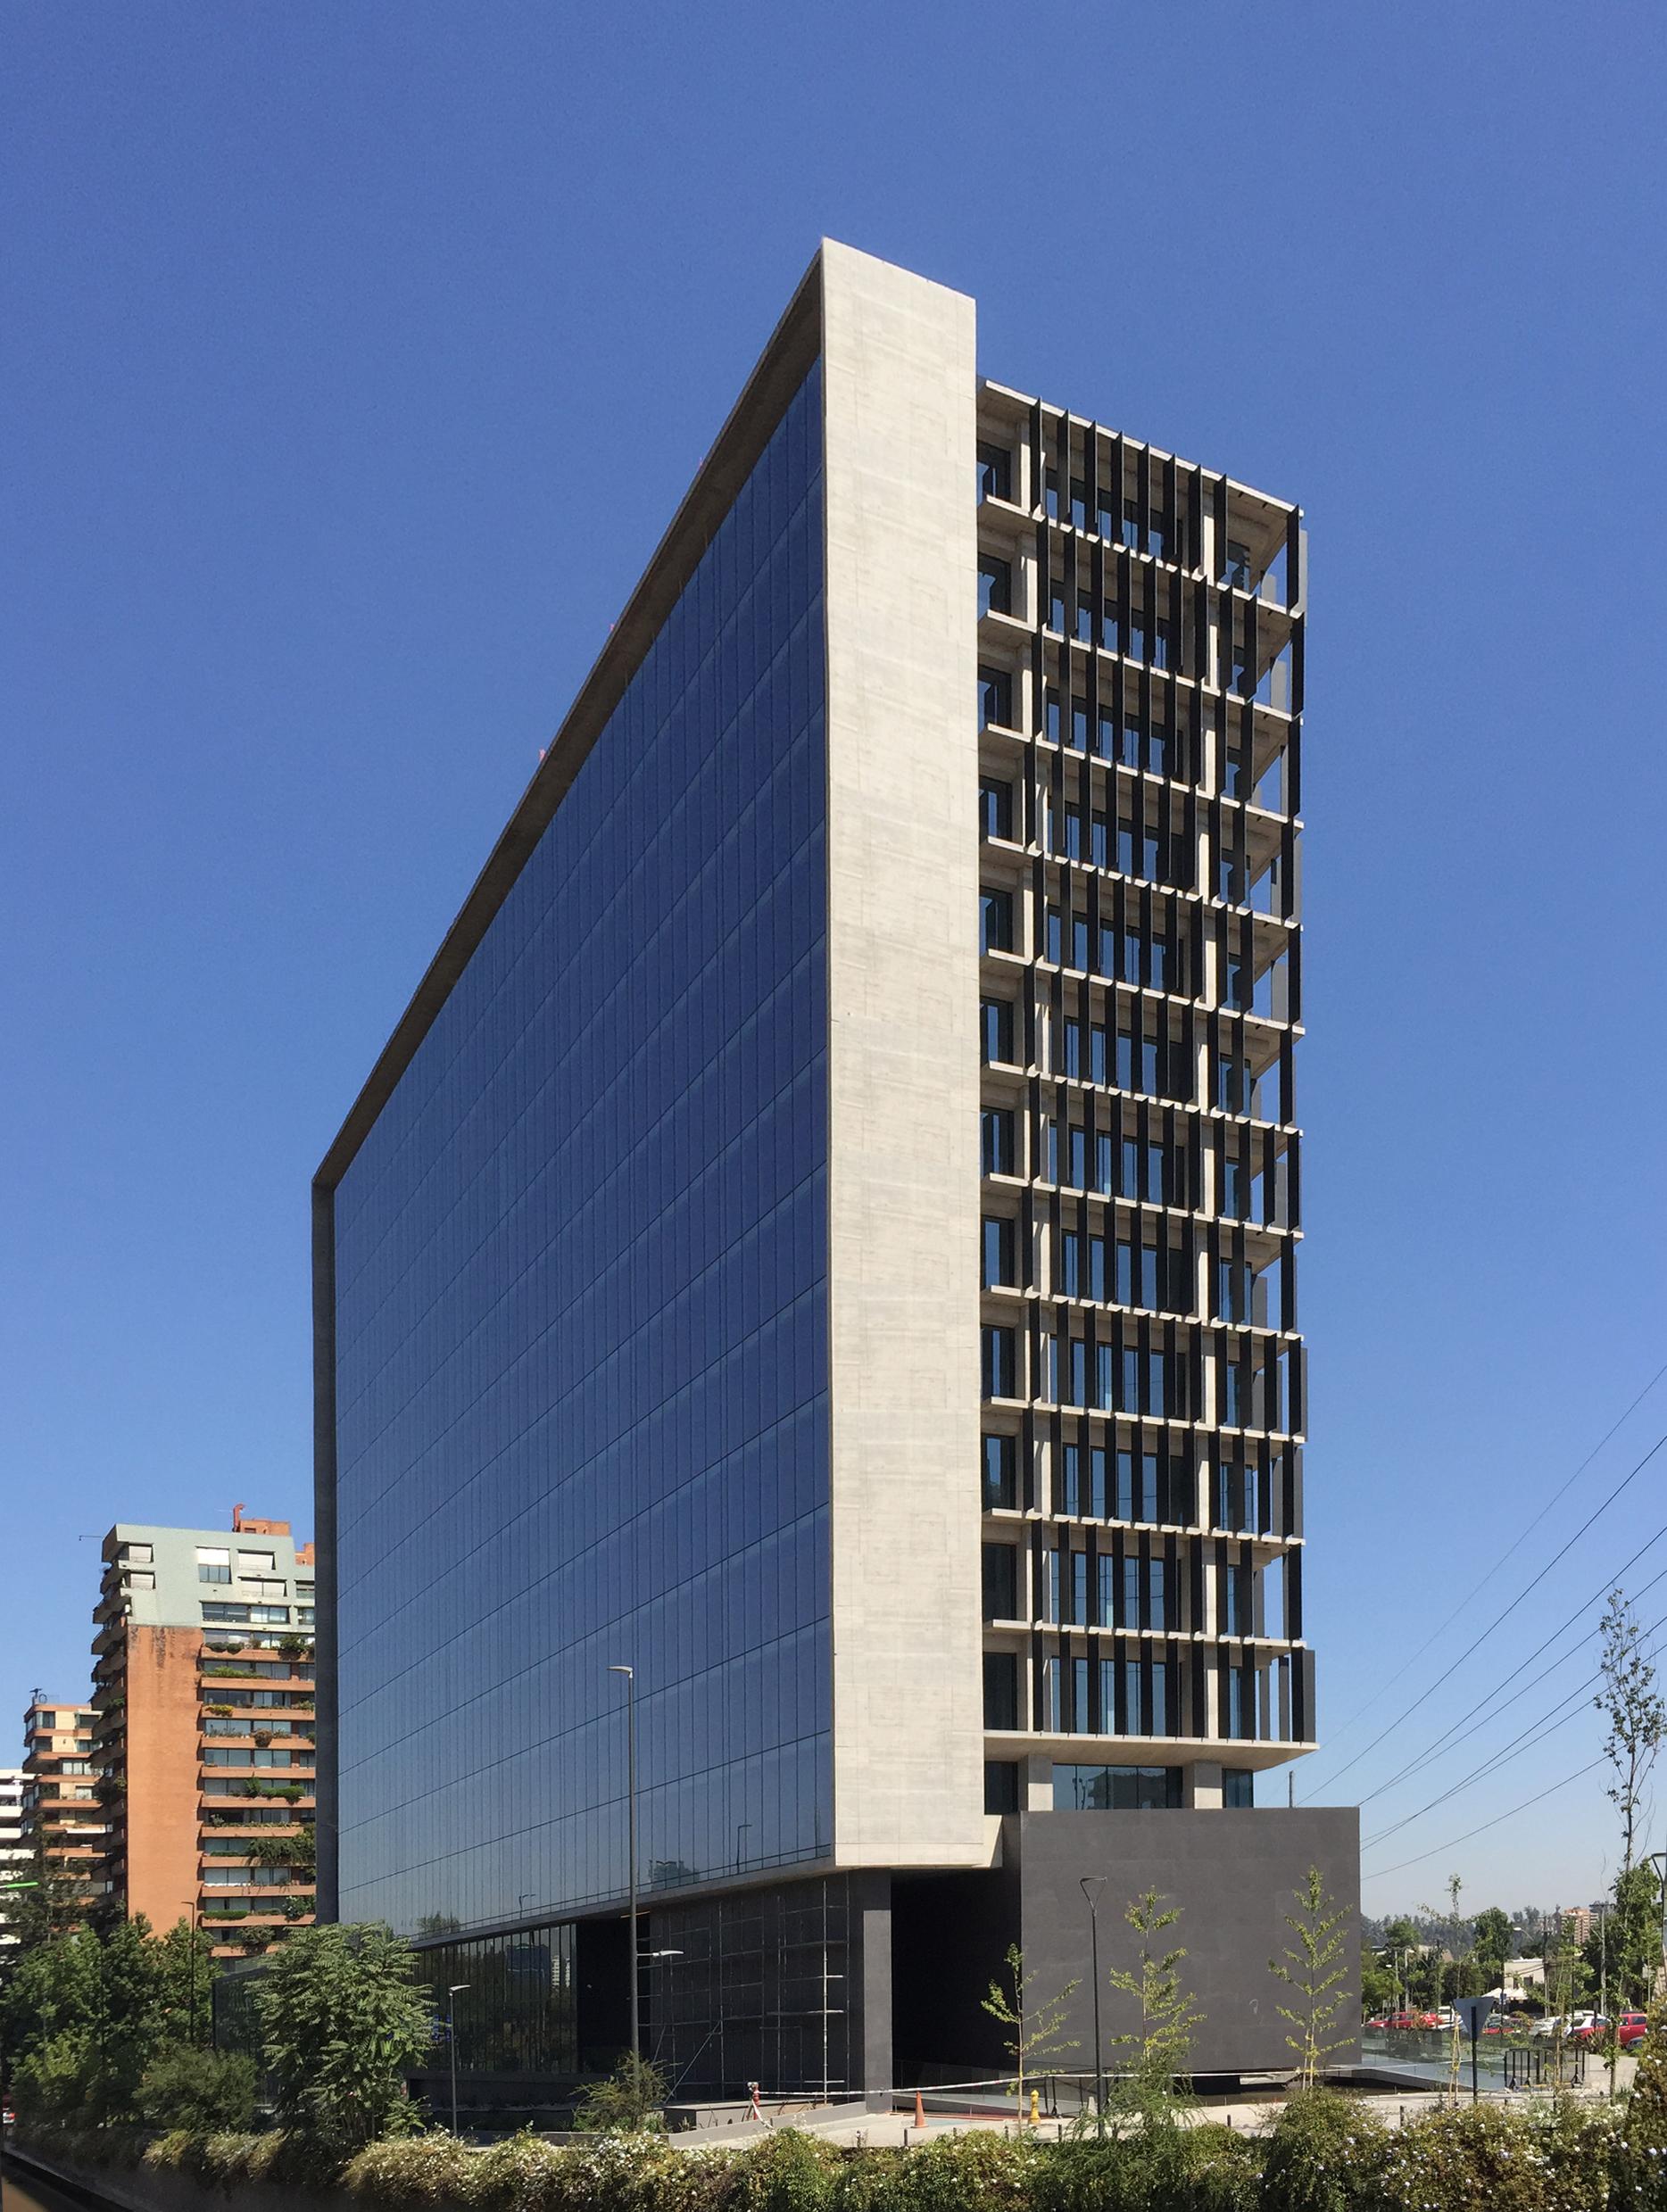 Edificio El Reloj